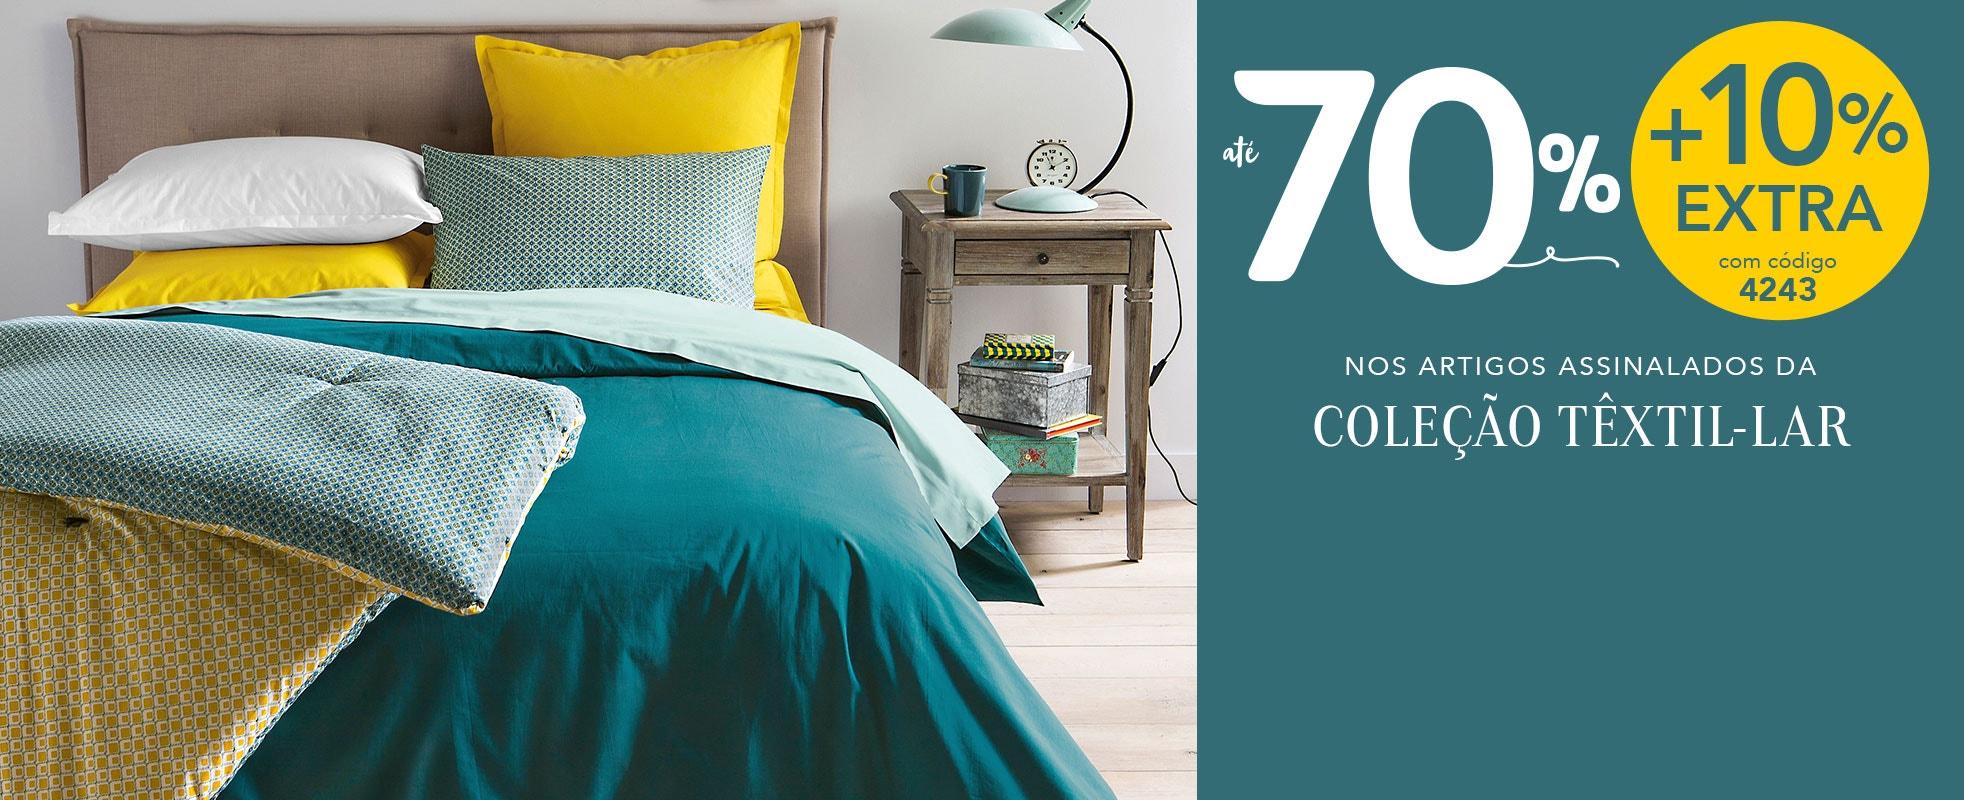 Têxtil-lar até 70%* + 10 EXTRA